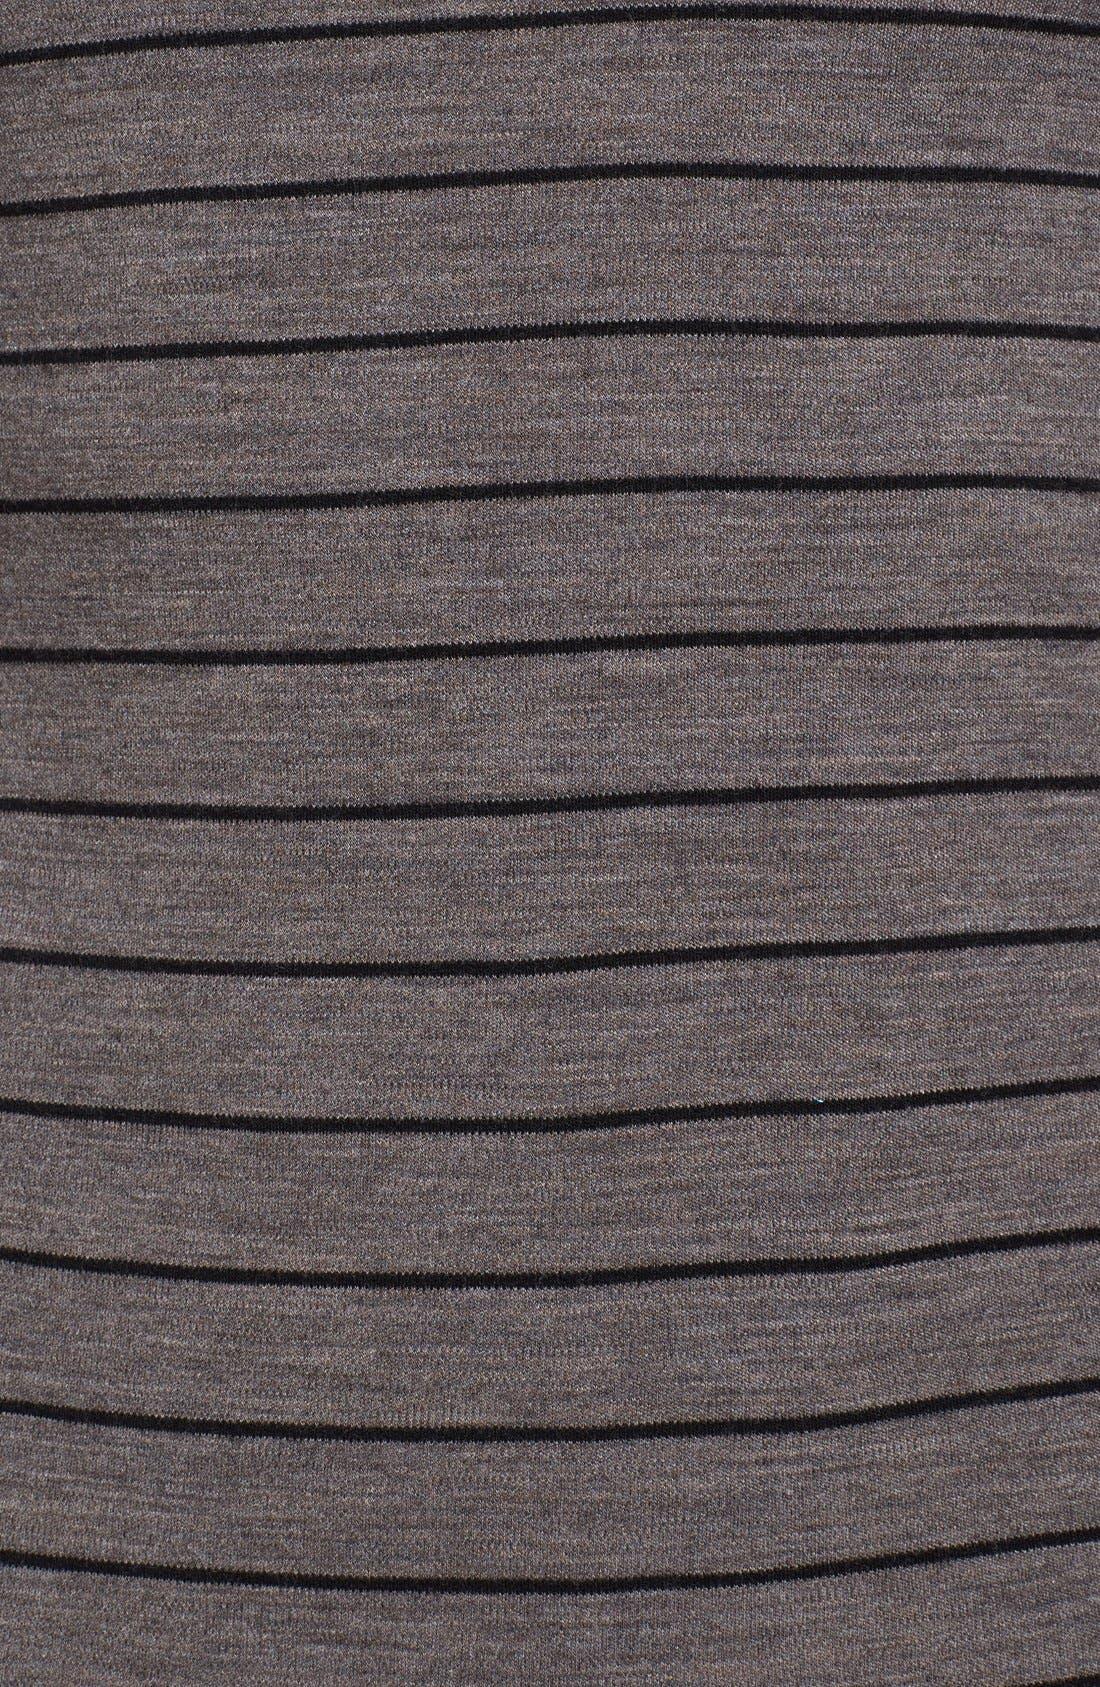 Alternate Image 3  - Smartwool 250g Base Layer Midweight Crewneck Shirt